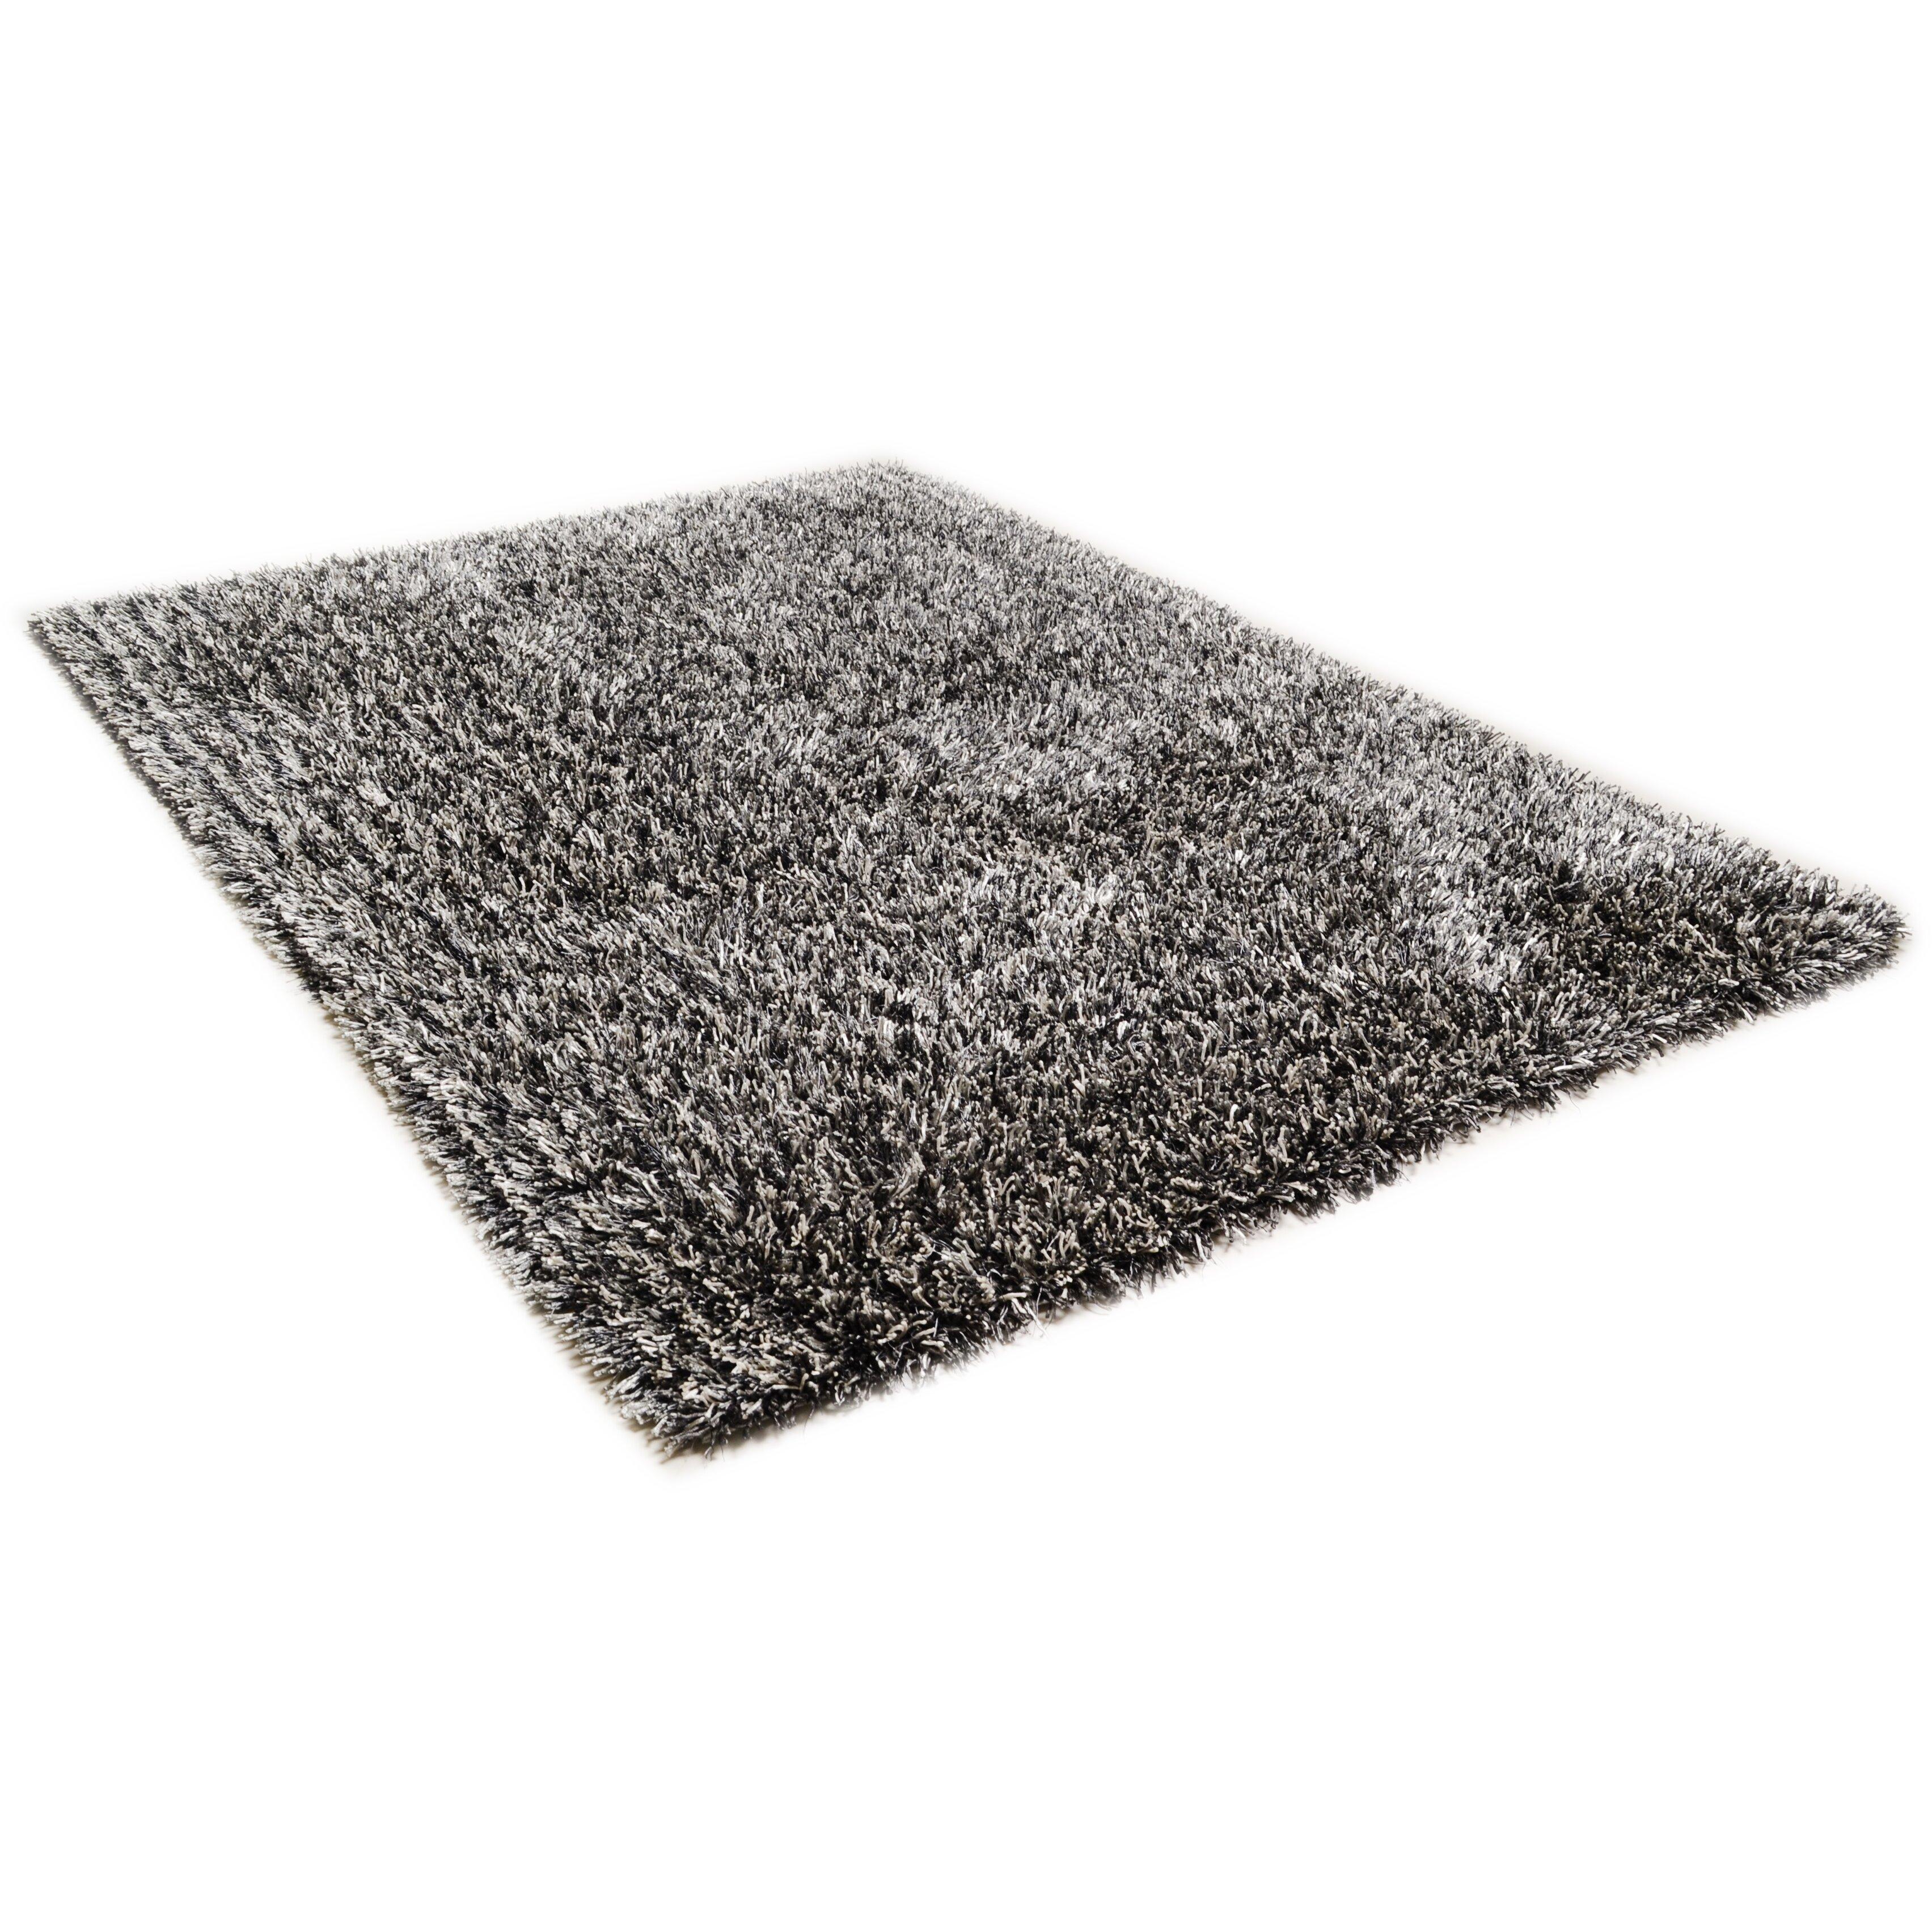 theko girly hand tufted grey area rug reviews wayfair uk